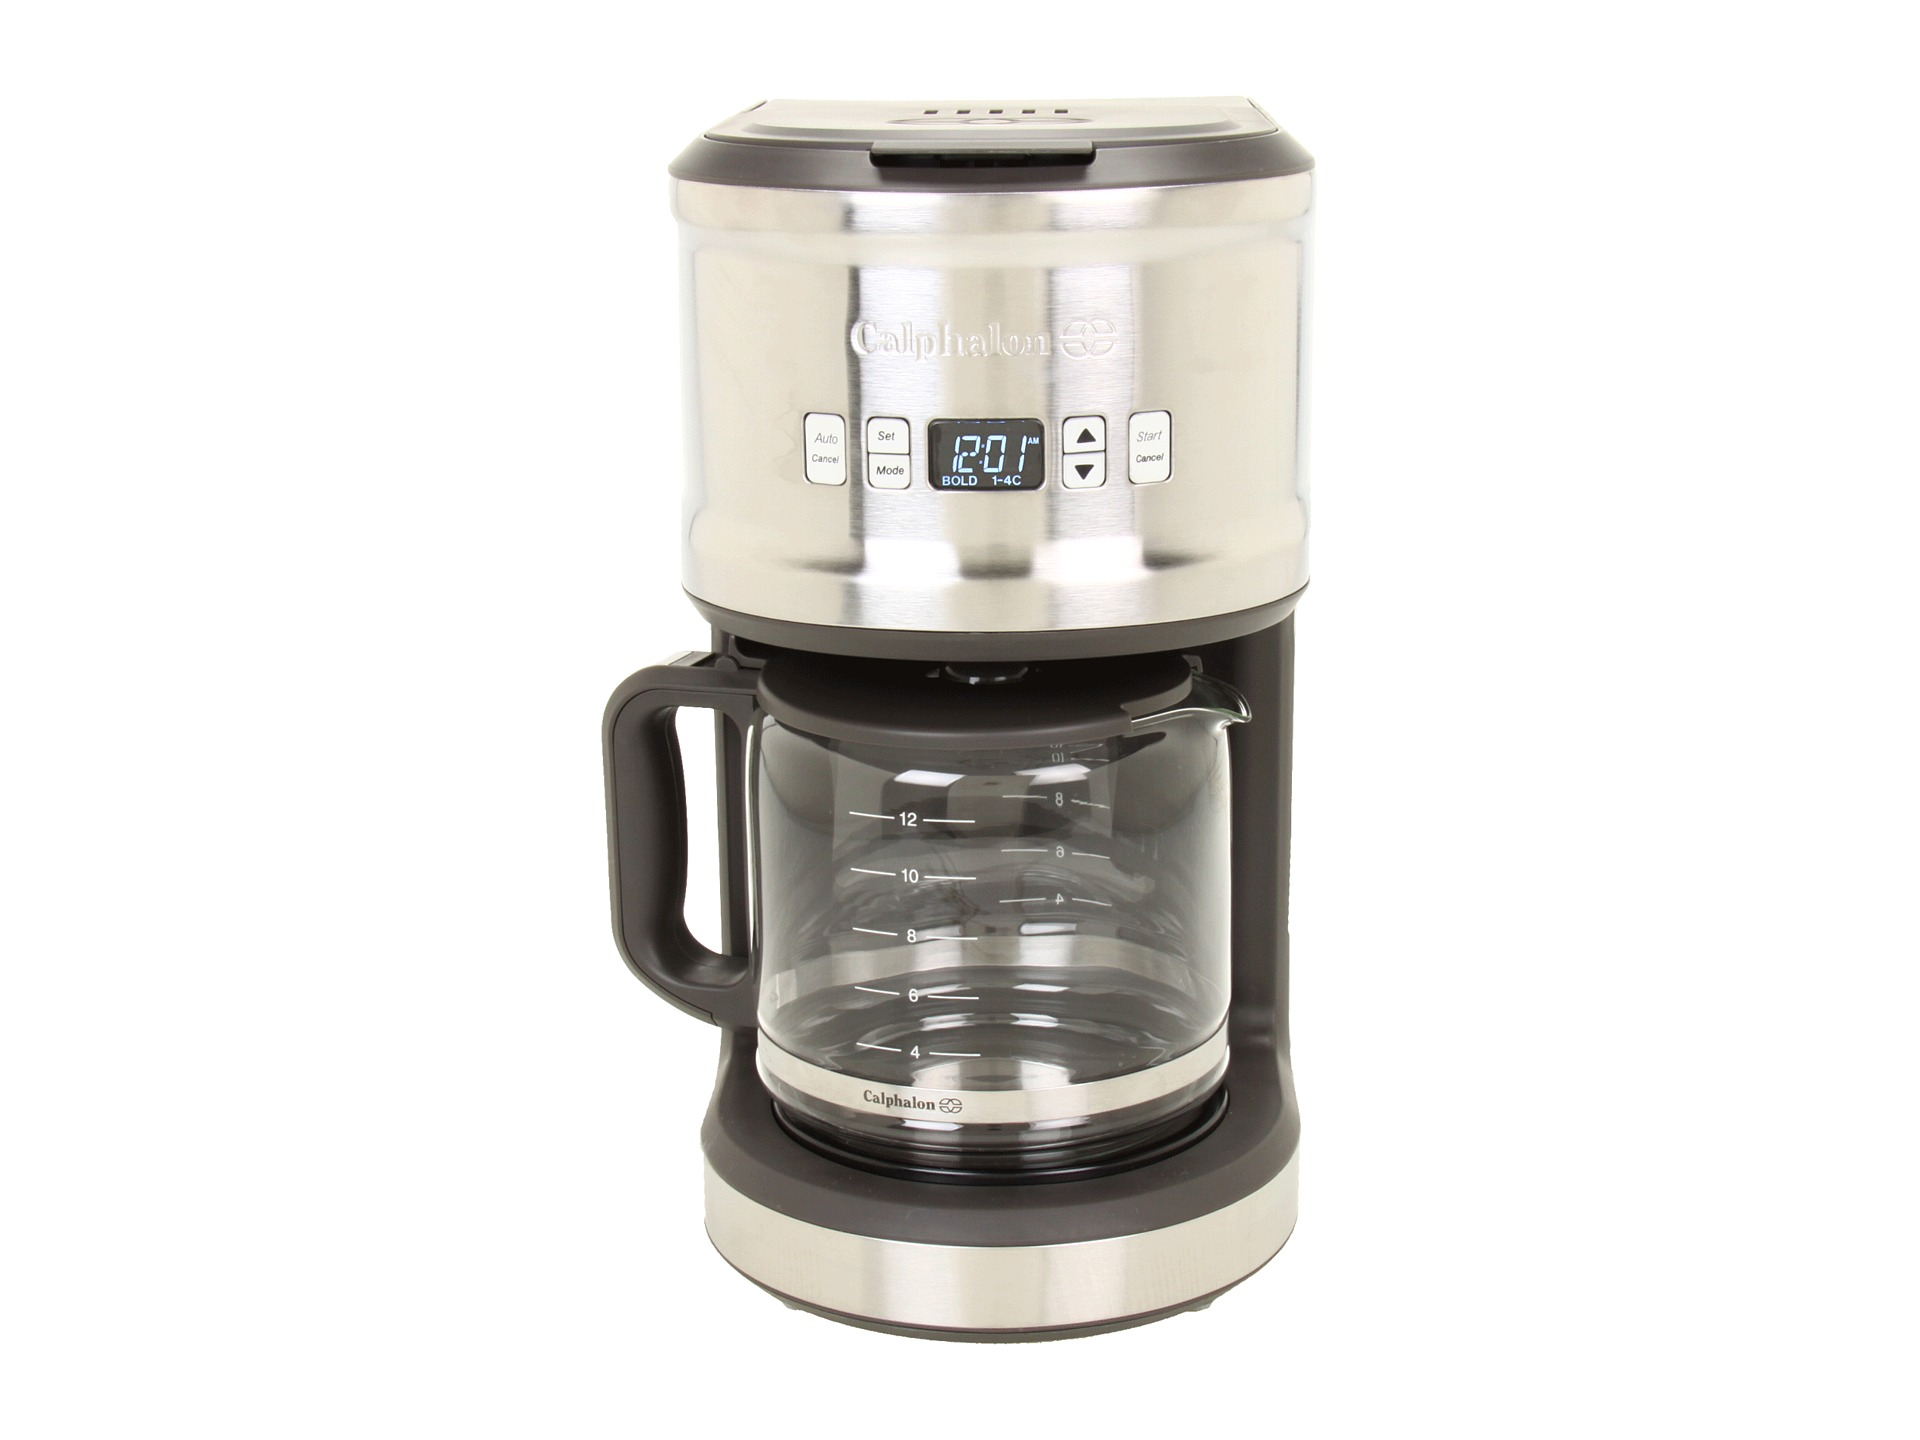 Calphalon Quick Brew Coffee Maker : Calphalon 1838803 Quick Brew 12 Cup Coffee Maker Shipped Free at Zappos